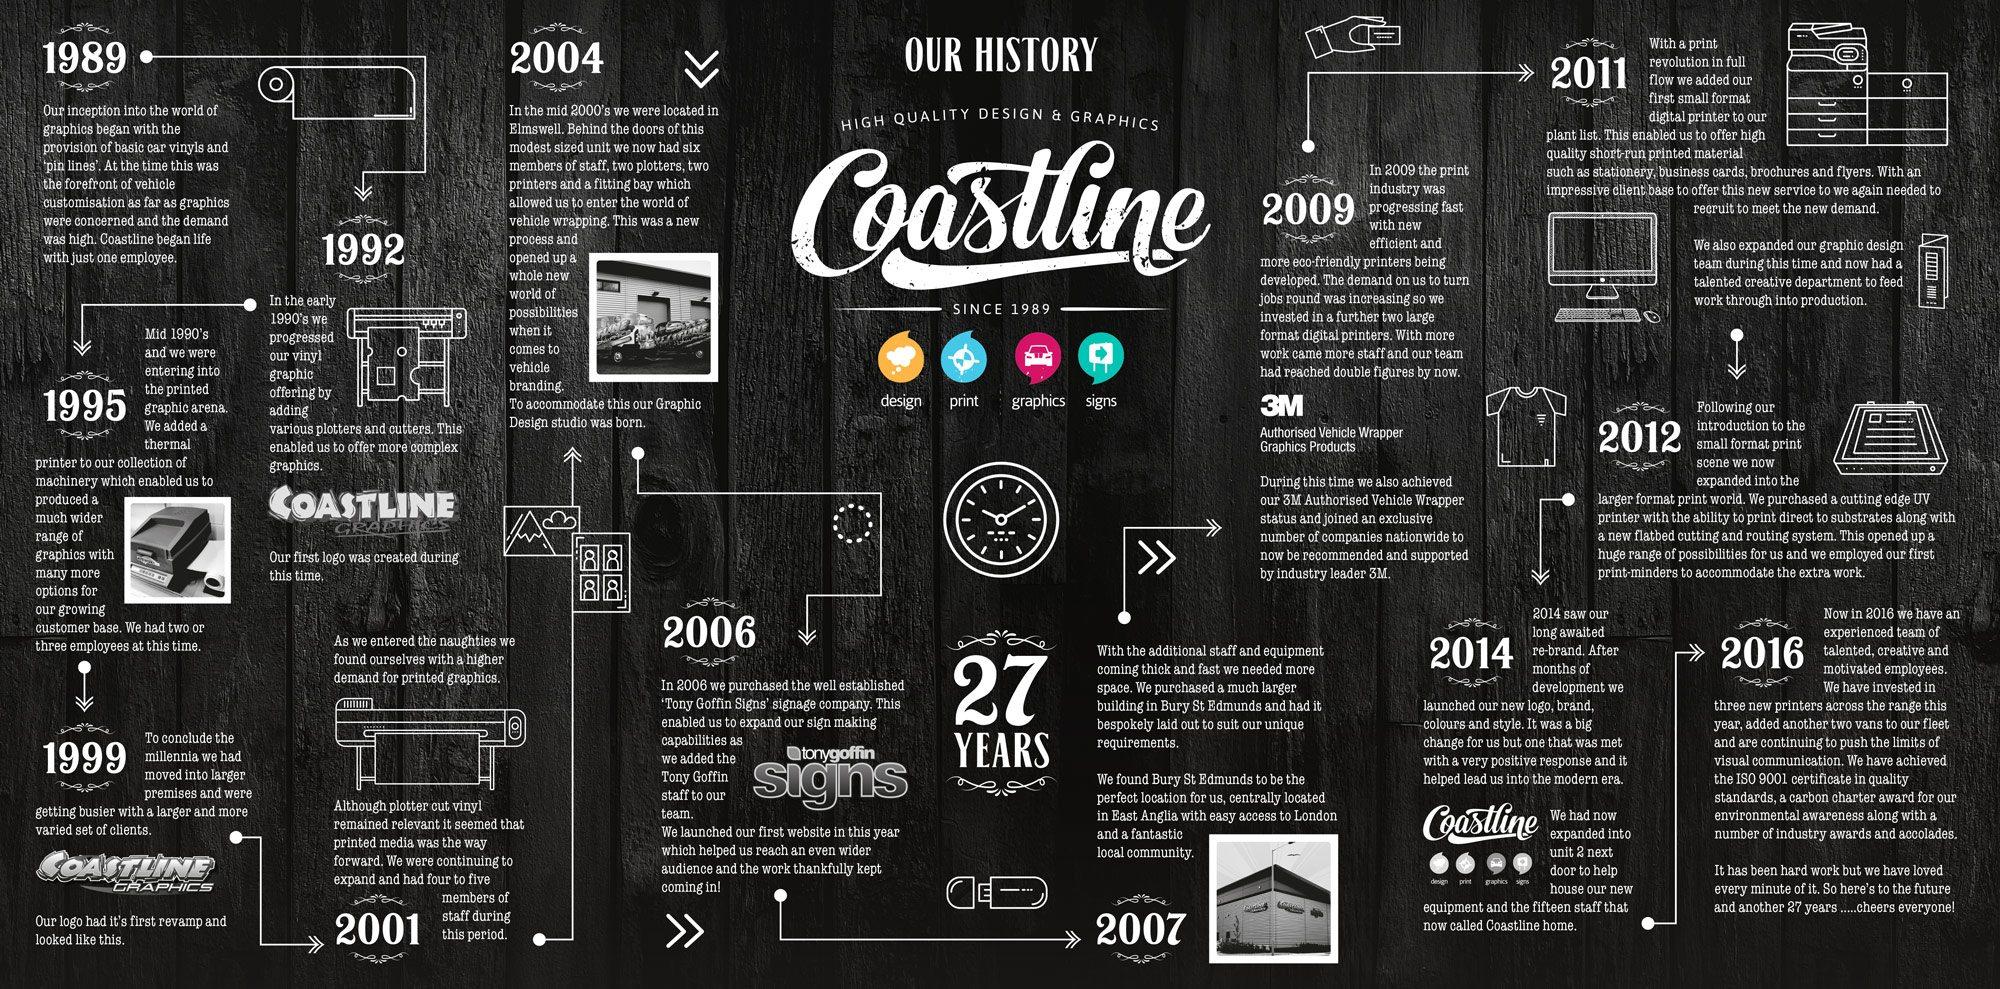 Coastline –Our History